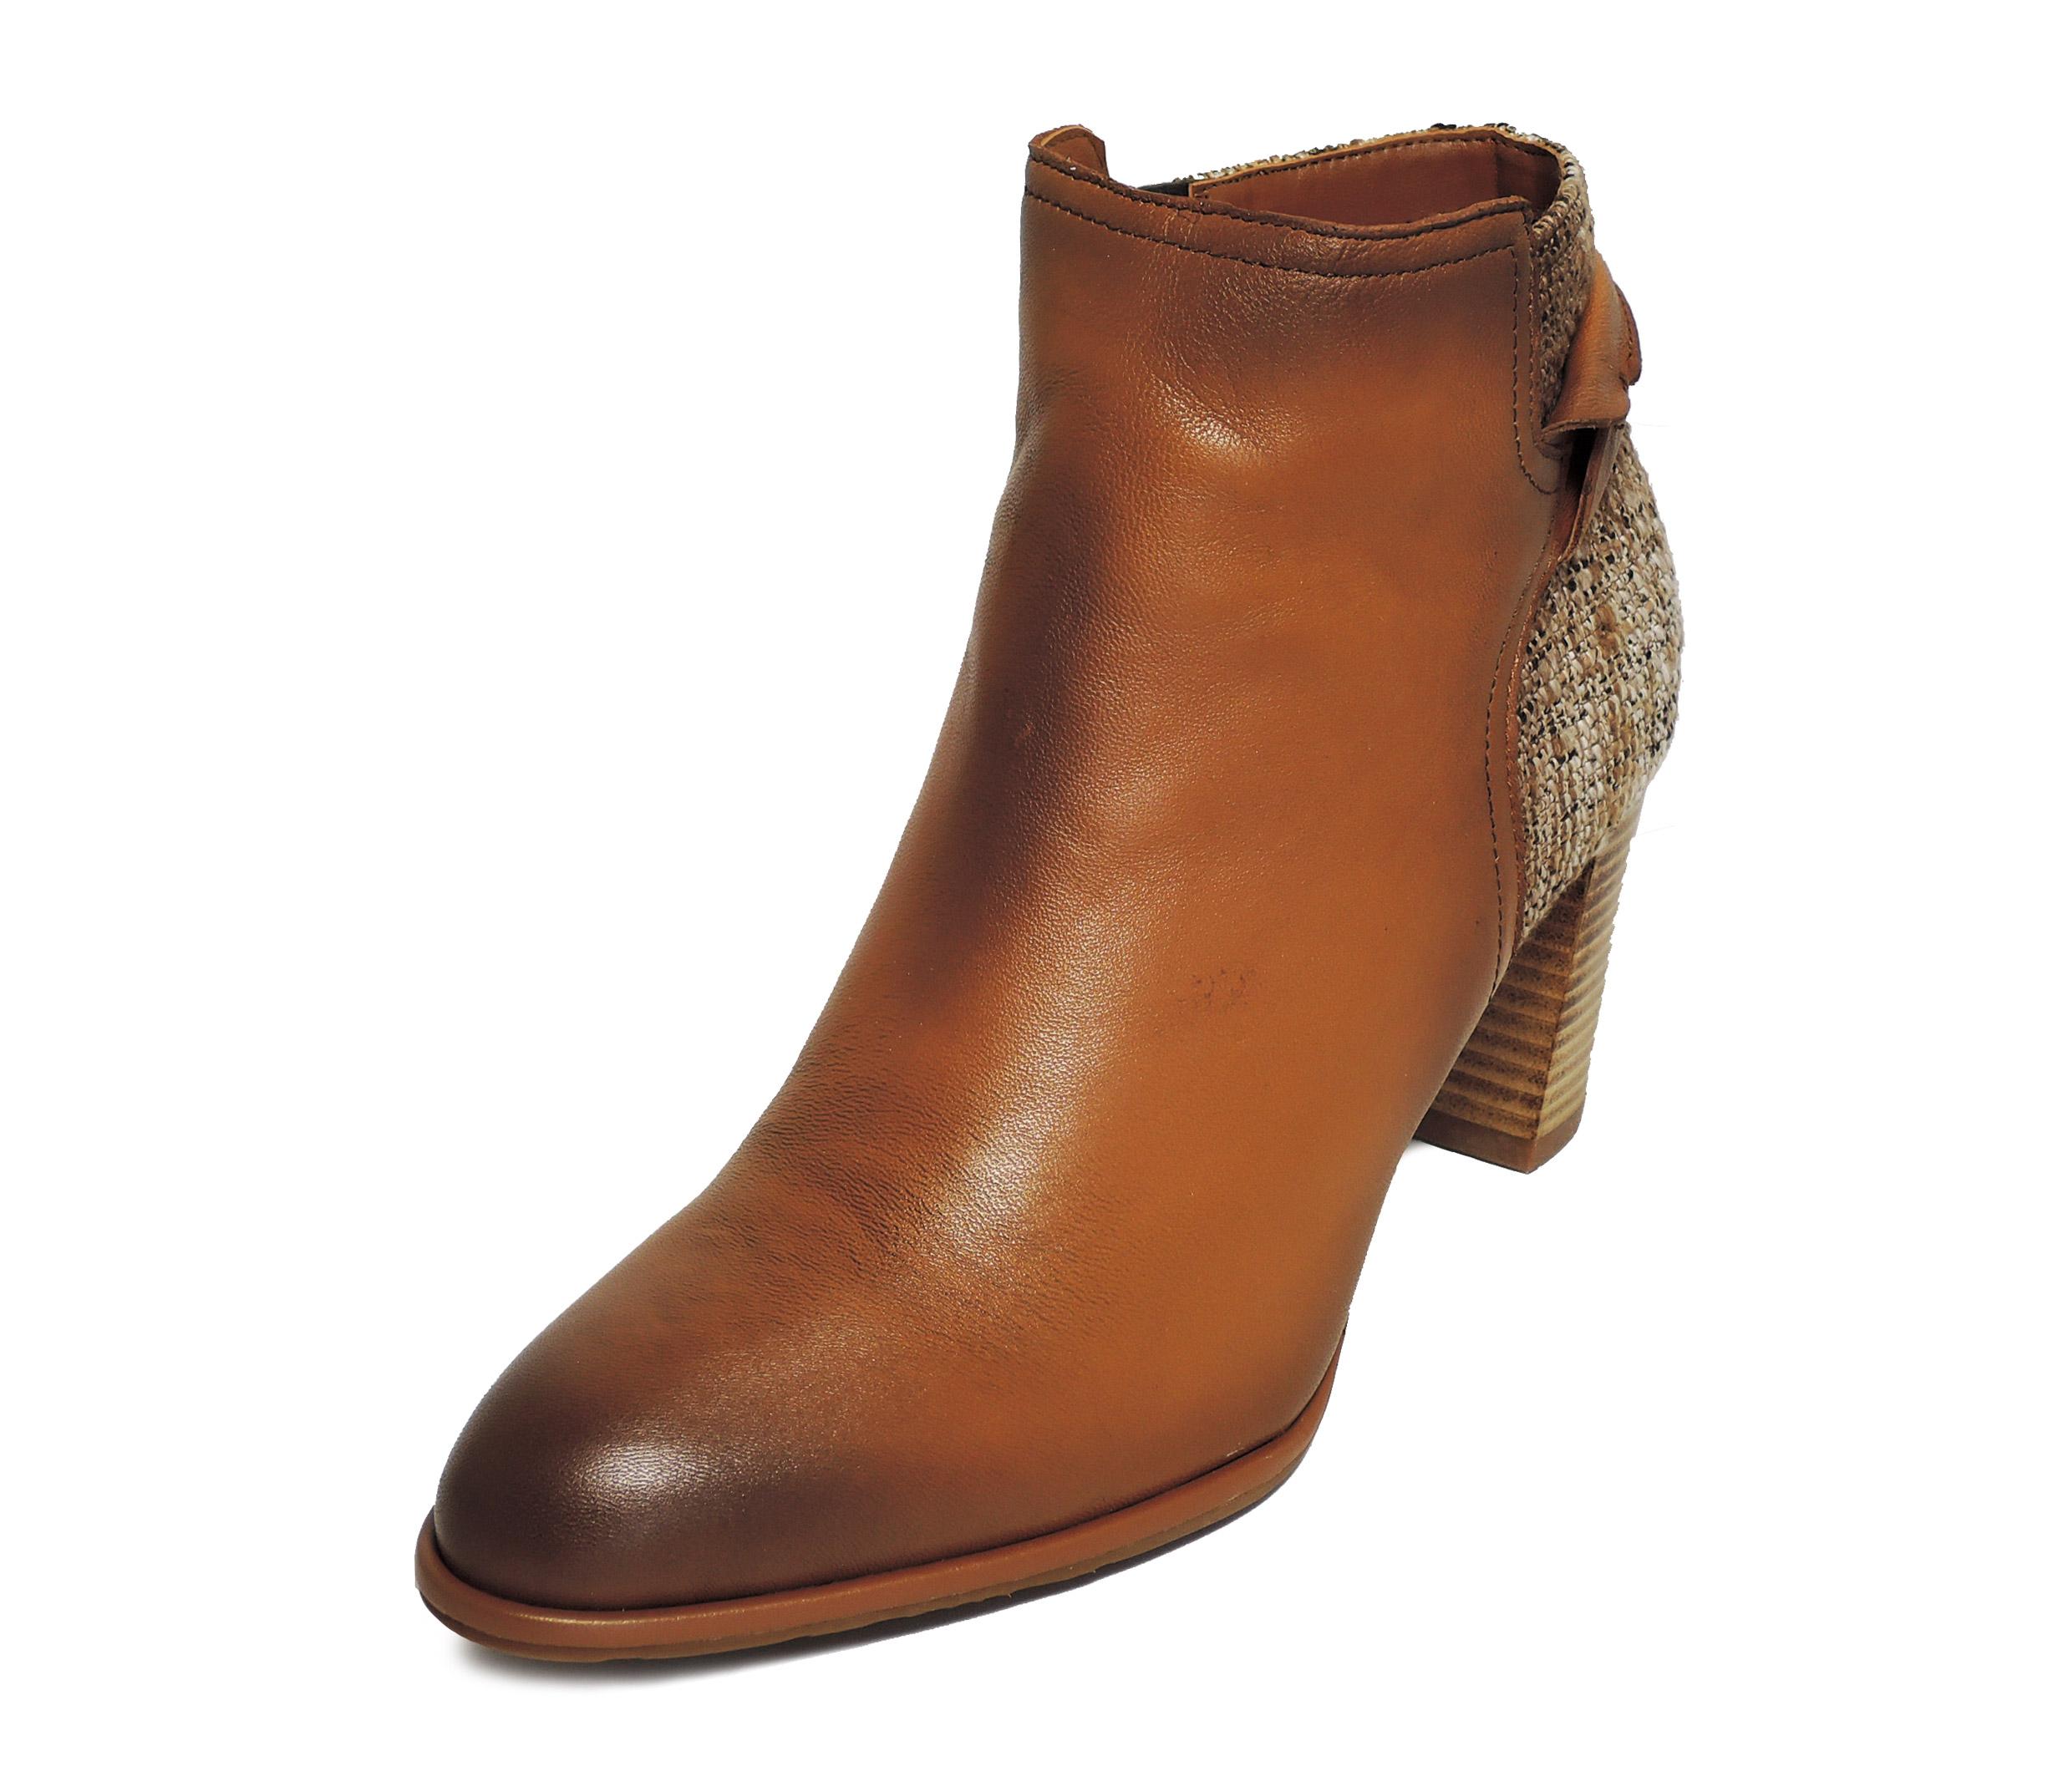 Boots talon femme